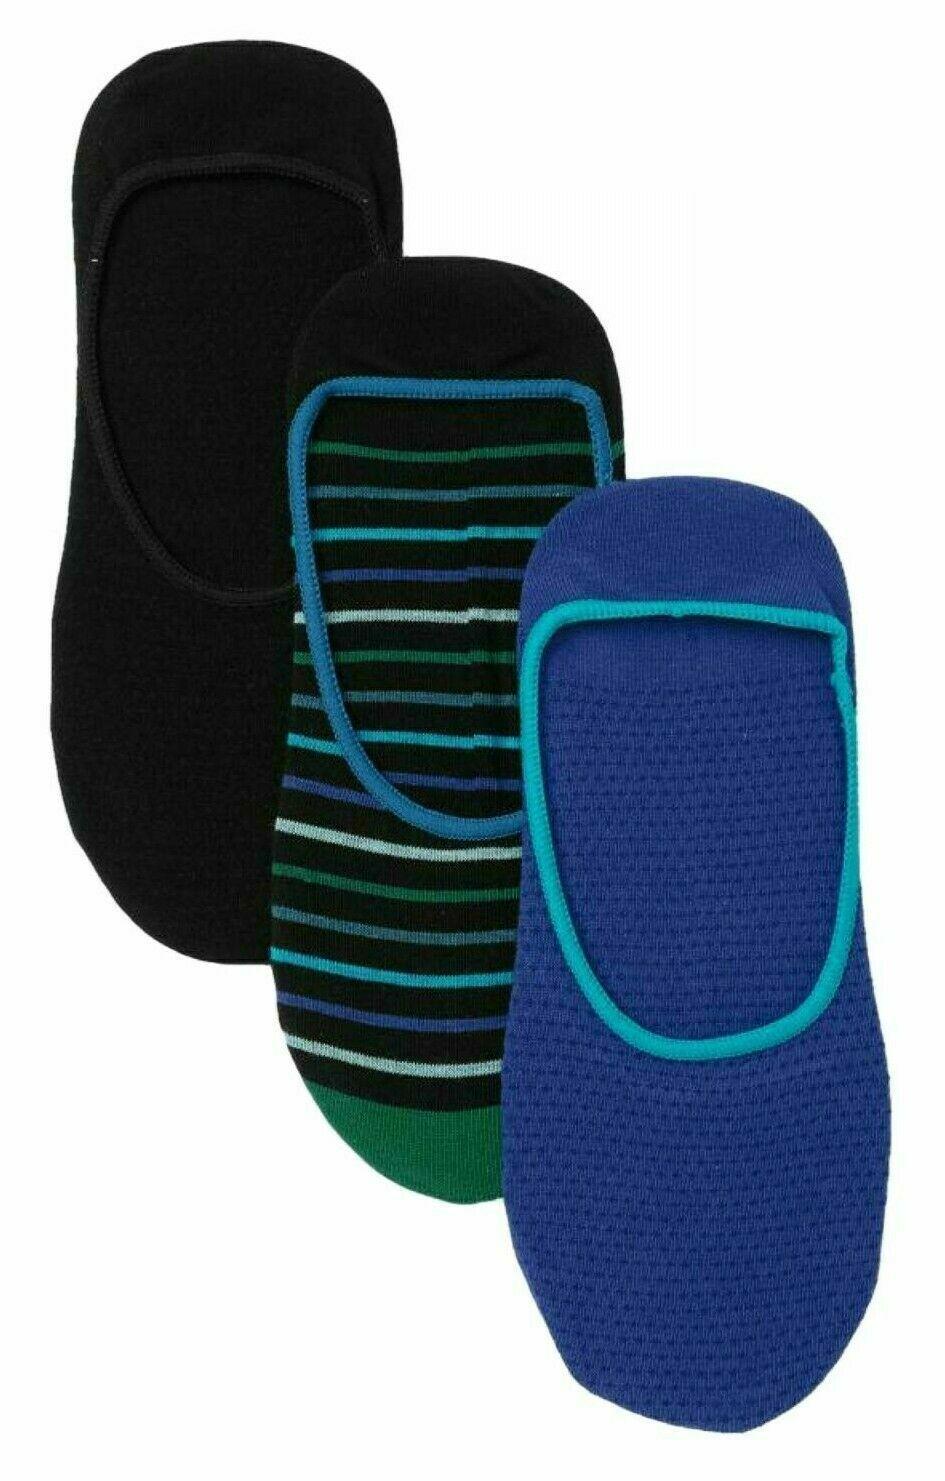 3 Pair Pack Hue Women's Striped & Solid High Cut Liner Socks Royal Blue Pack